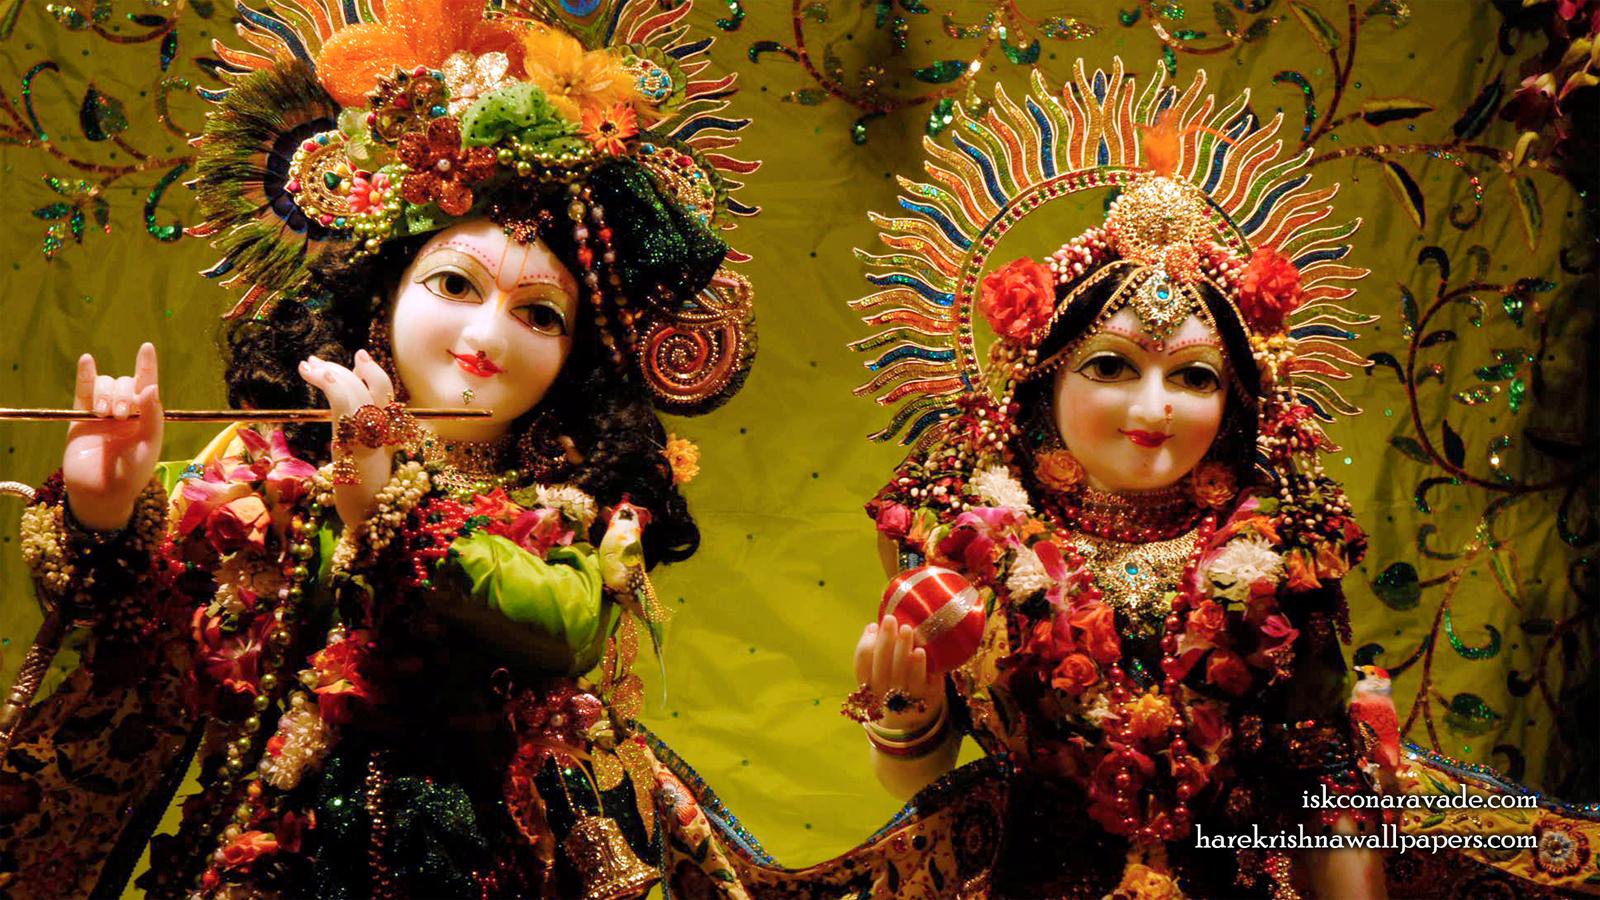 Sri Sri Radha Gopal Close up Wallpaper (001) Size 1600x900 Download